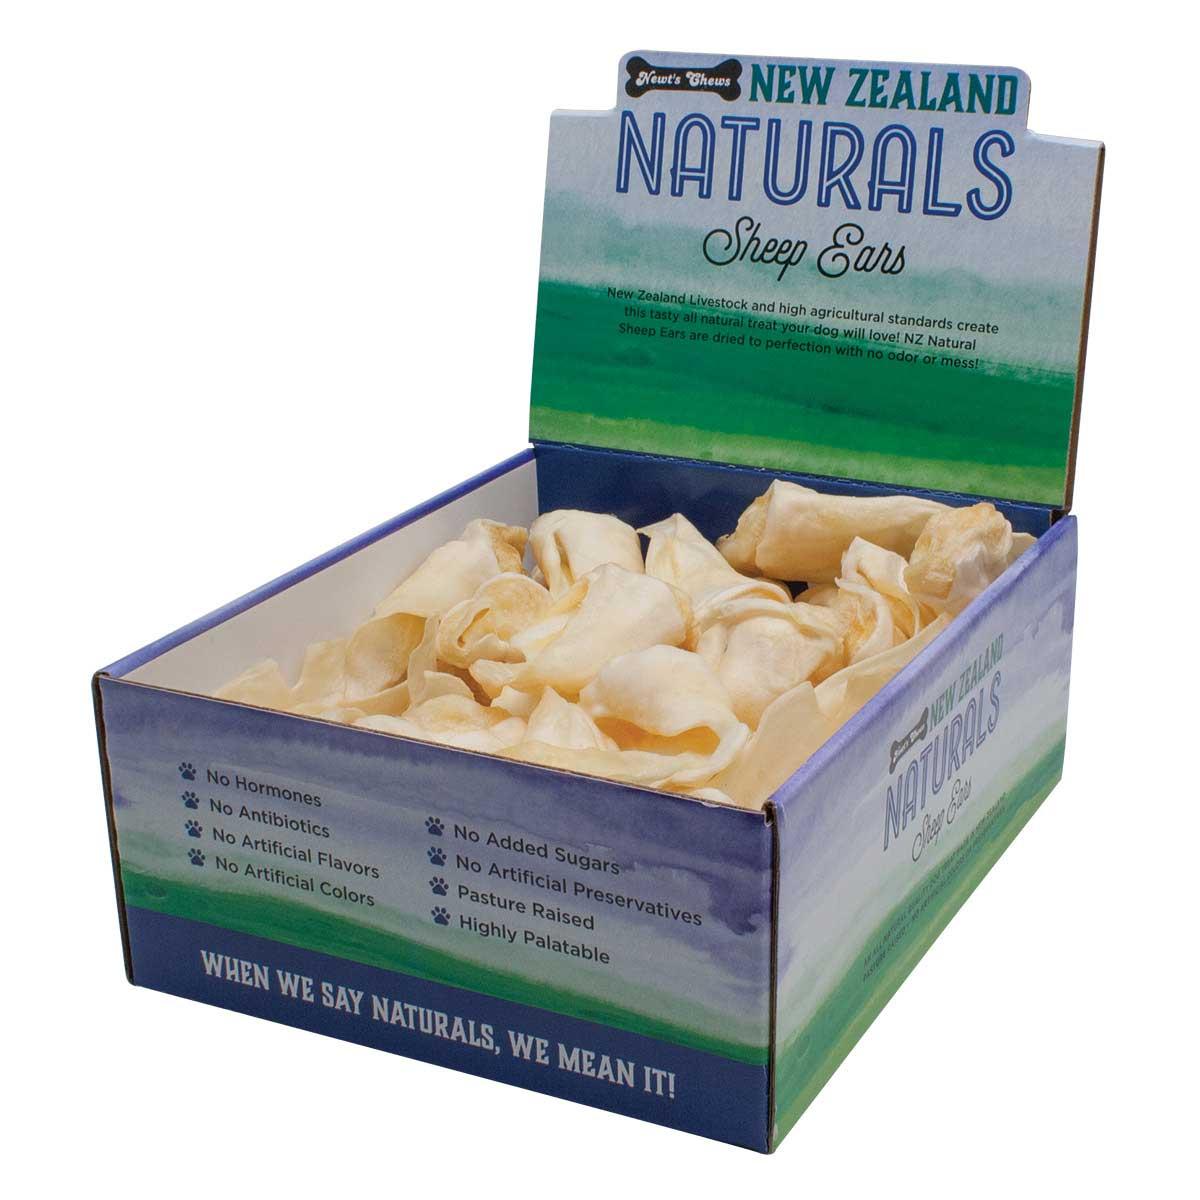 New Zeland Naturals Sheep Ears Display Box 50 Count